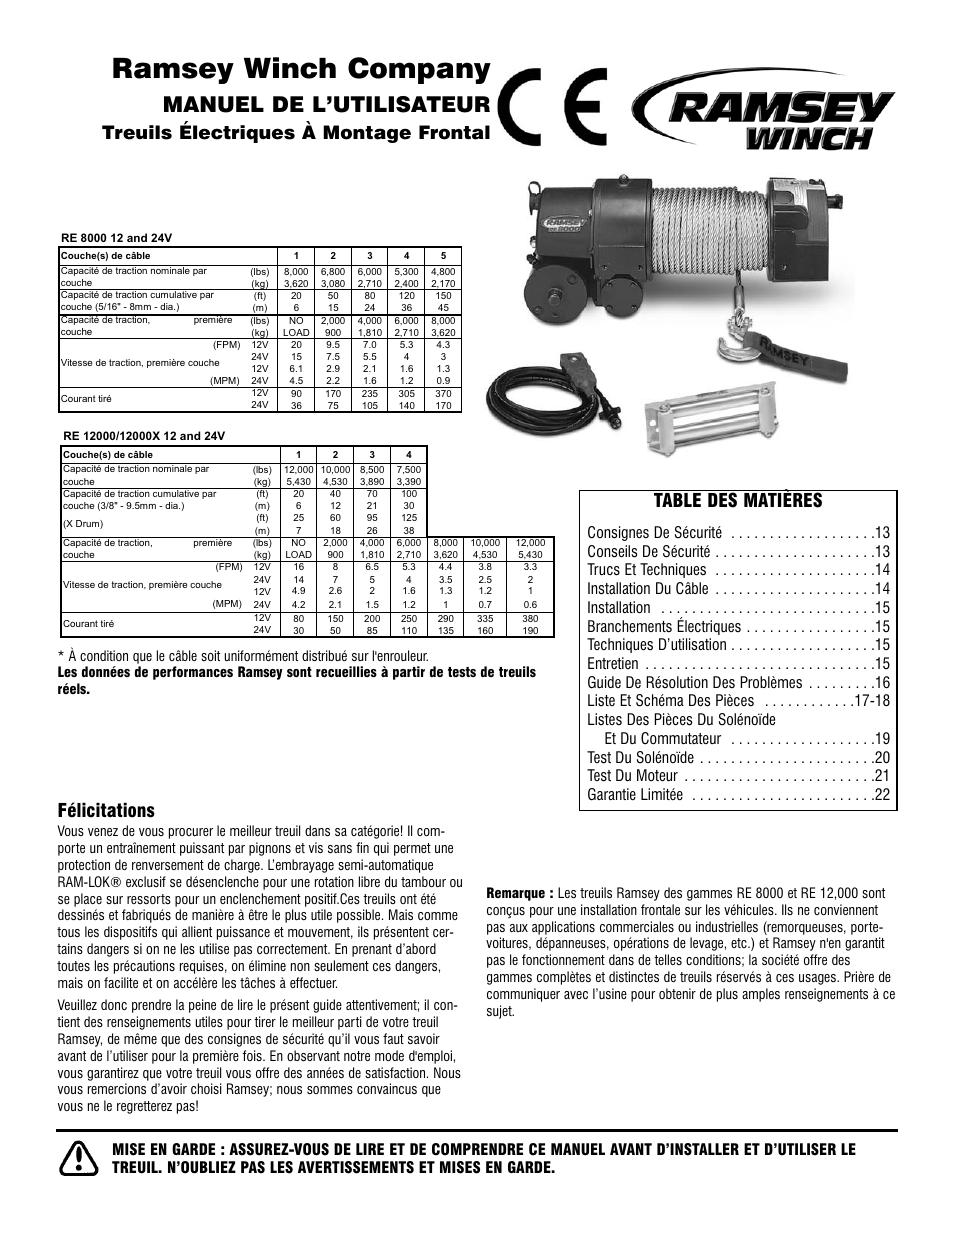 Ramsey winch company, Manuel de l'utilisateur